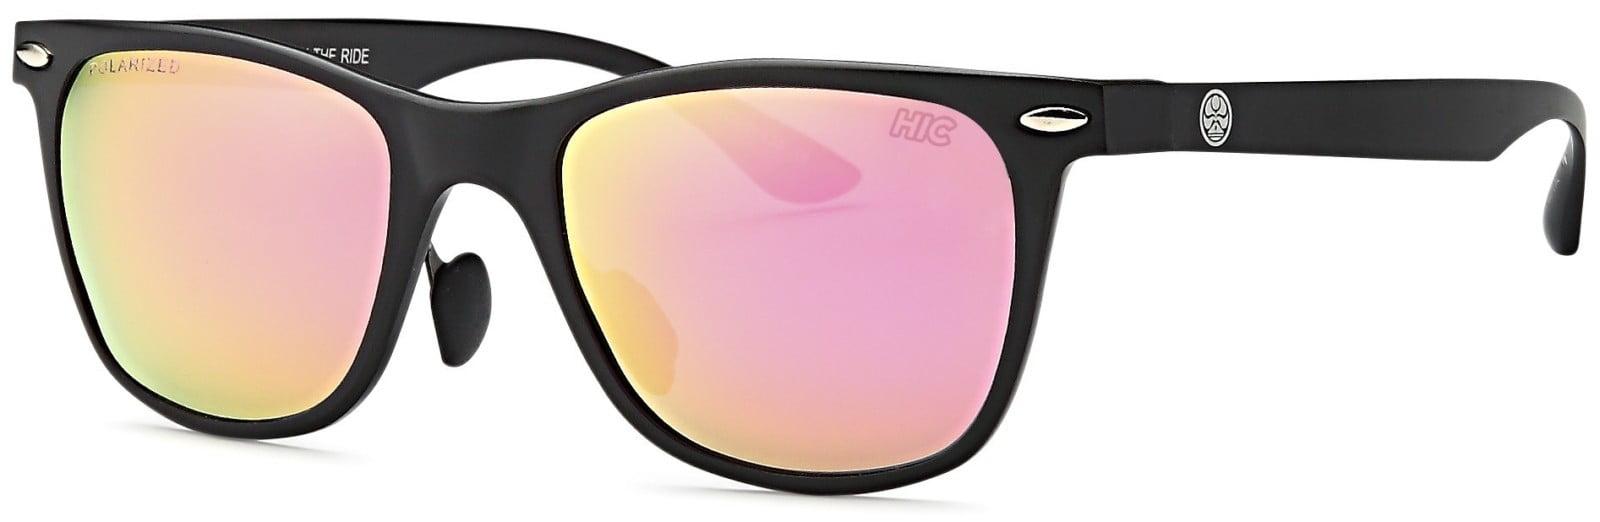 HIC SRF Sunglasses